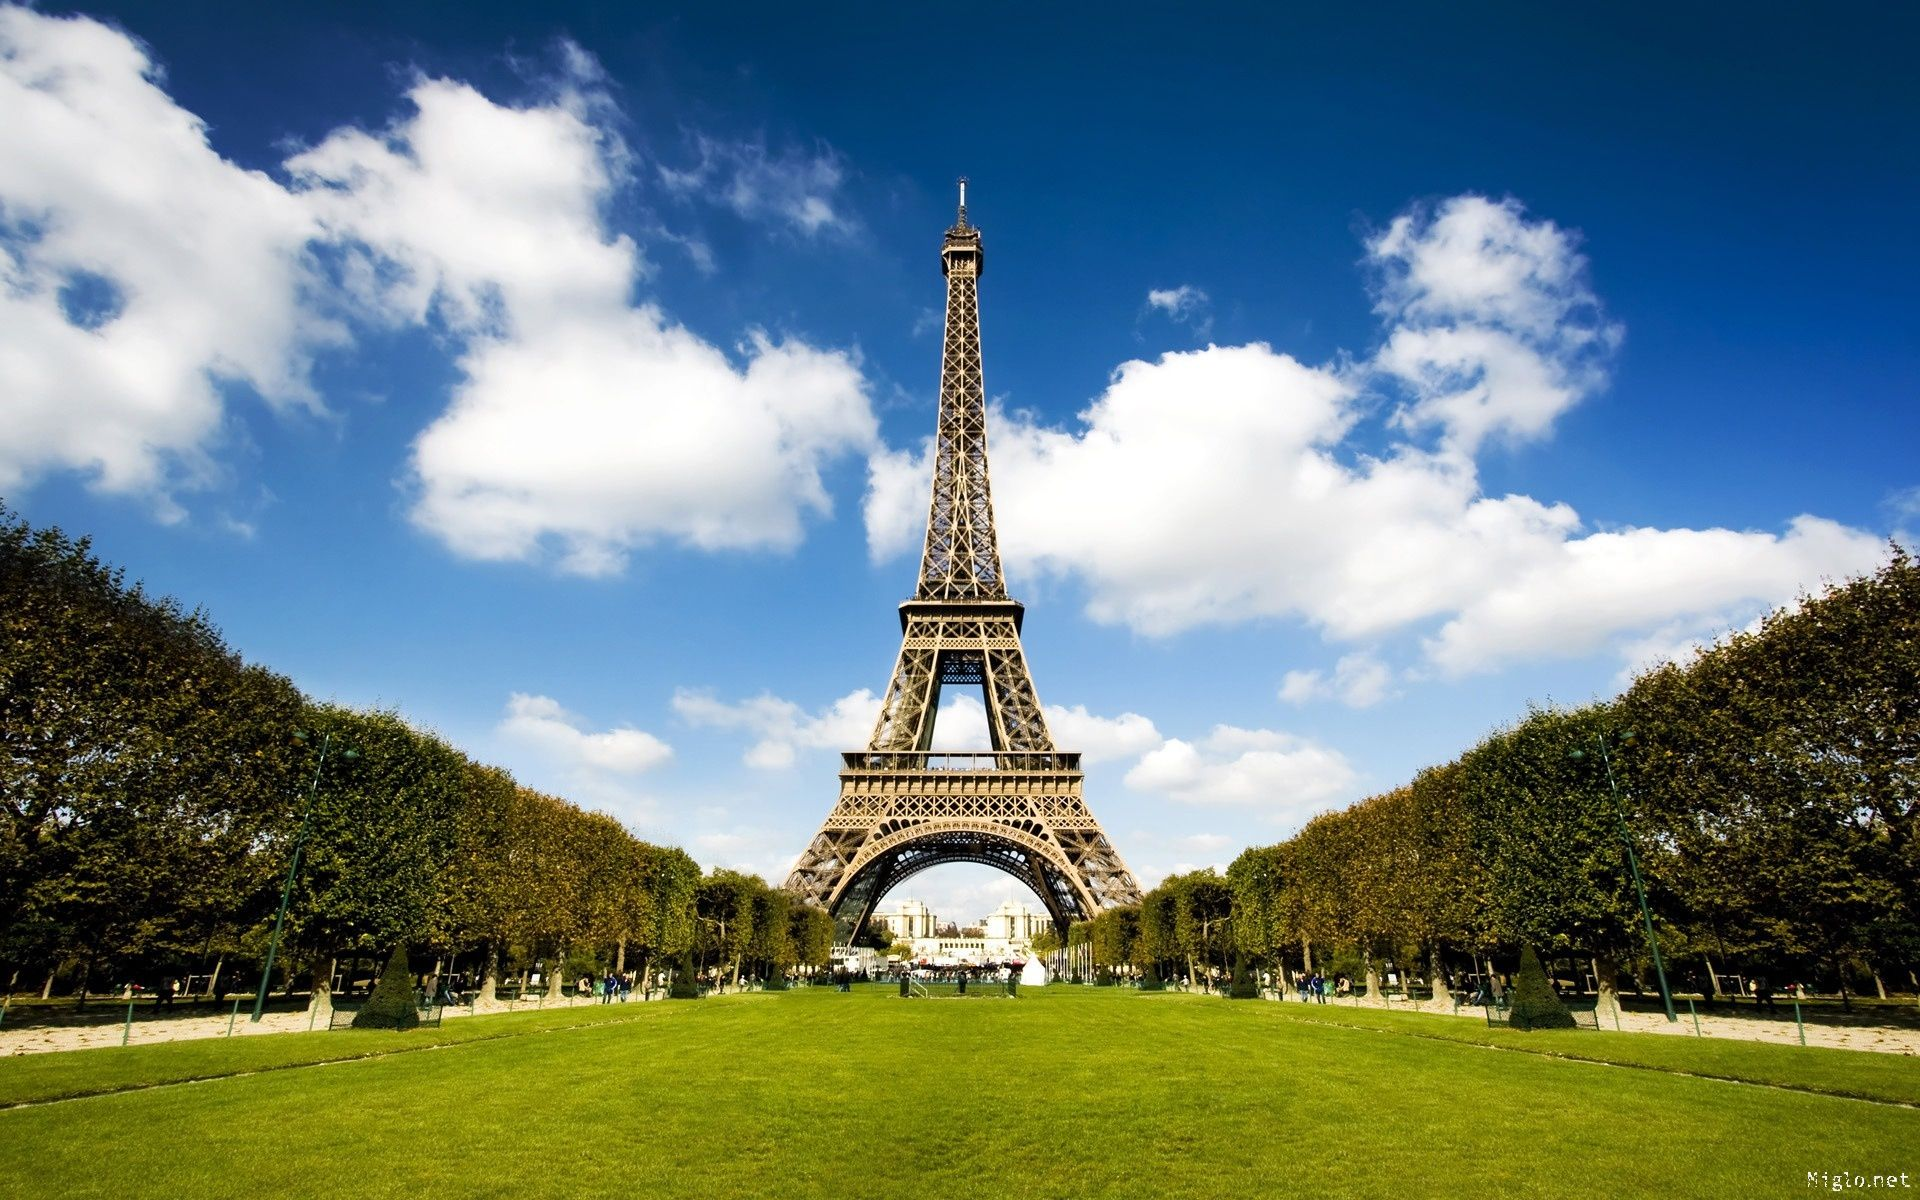 Paris Top HD Picture IPhone HiRes Wallpaper Wallpaperback City Hd Iphone Hires 4220 Background